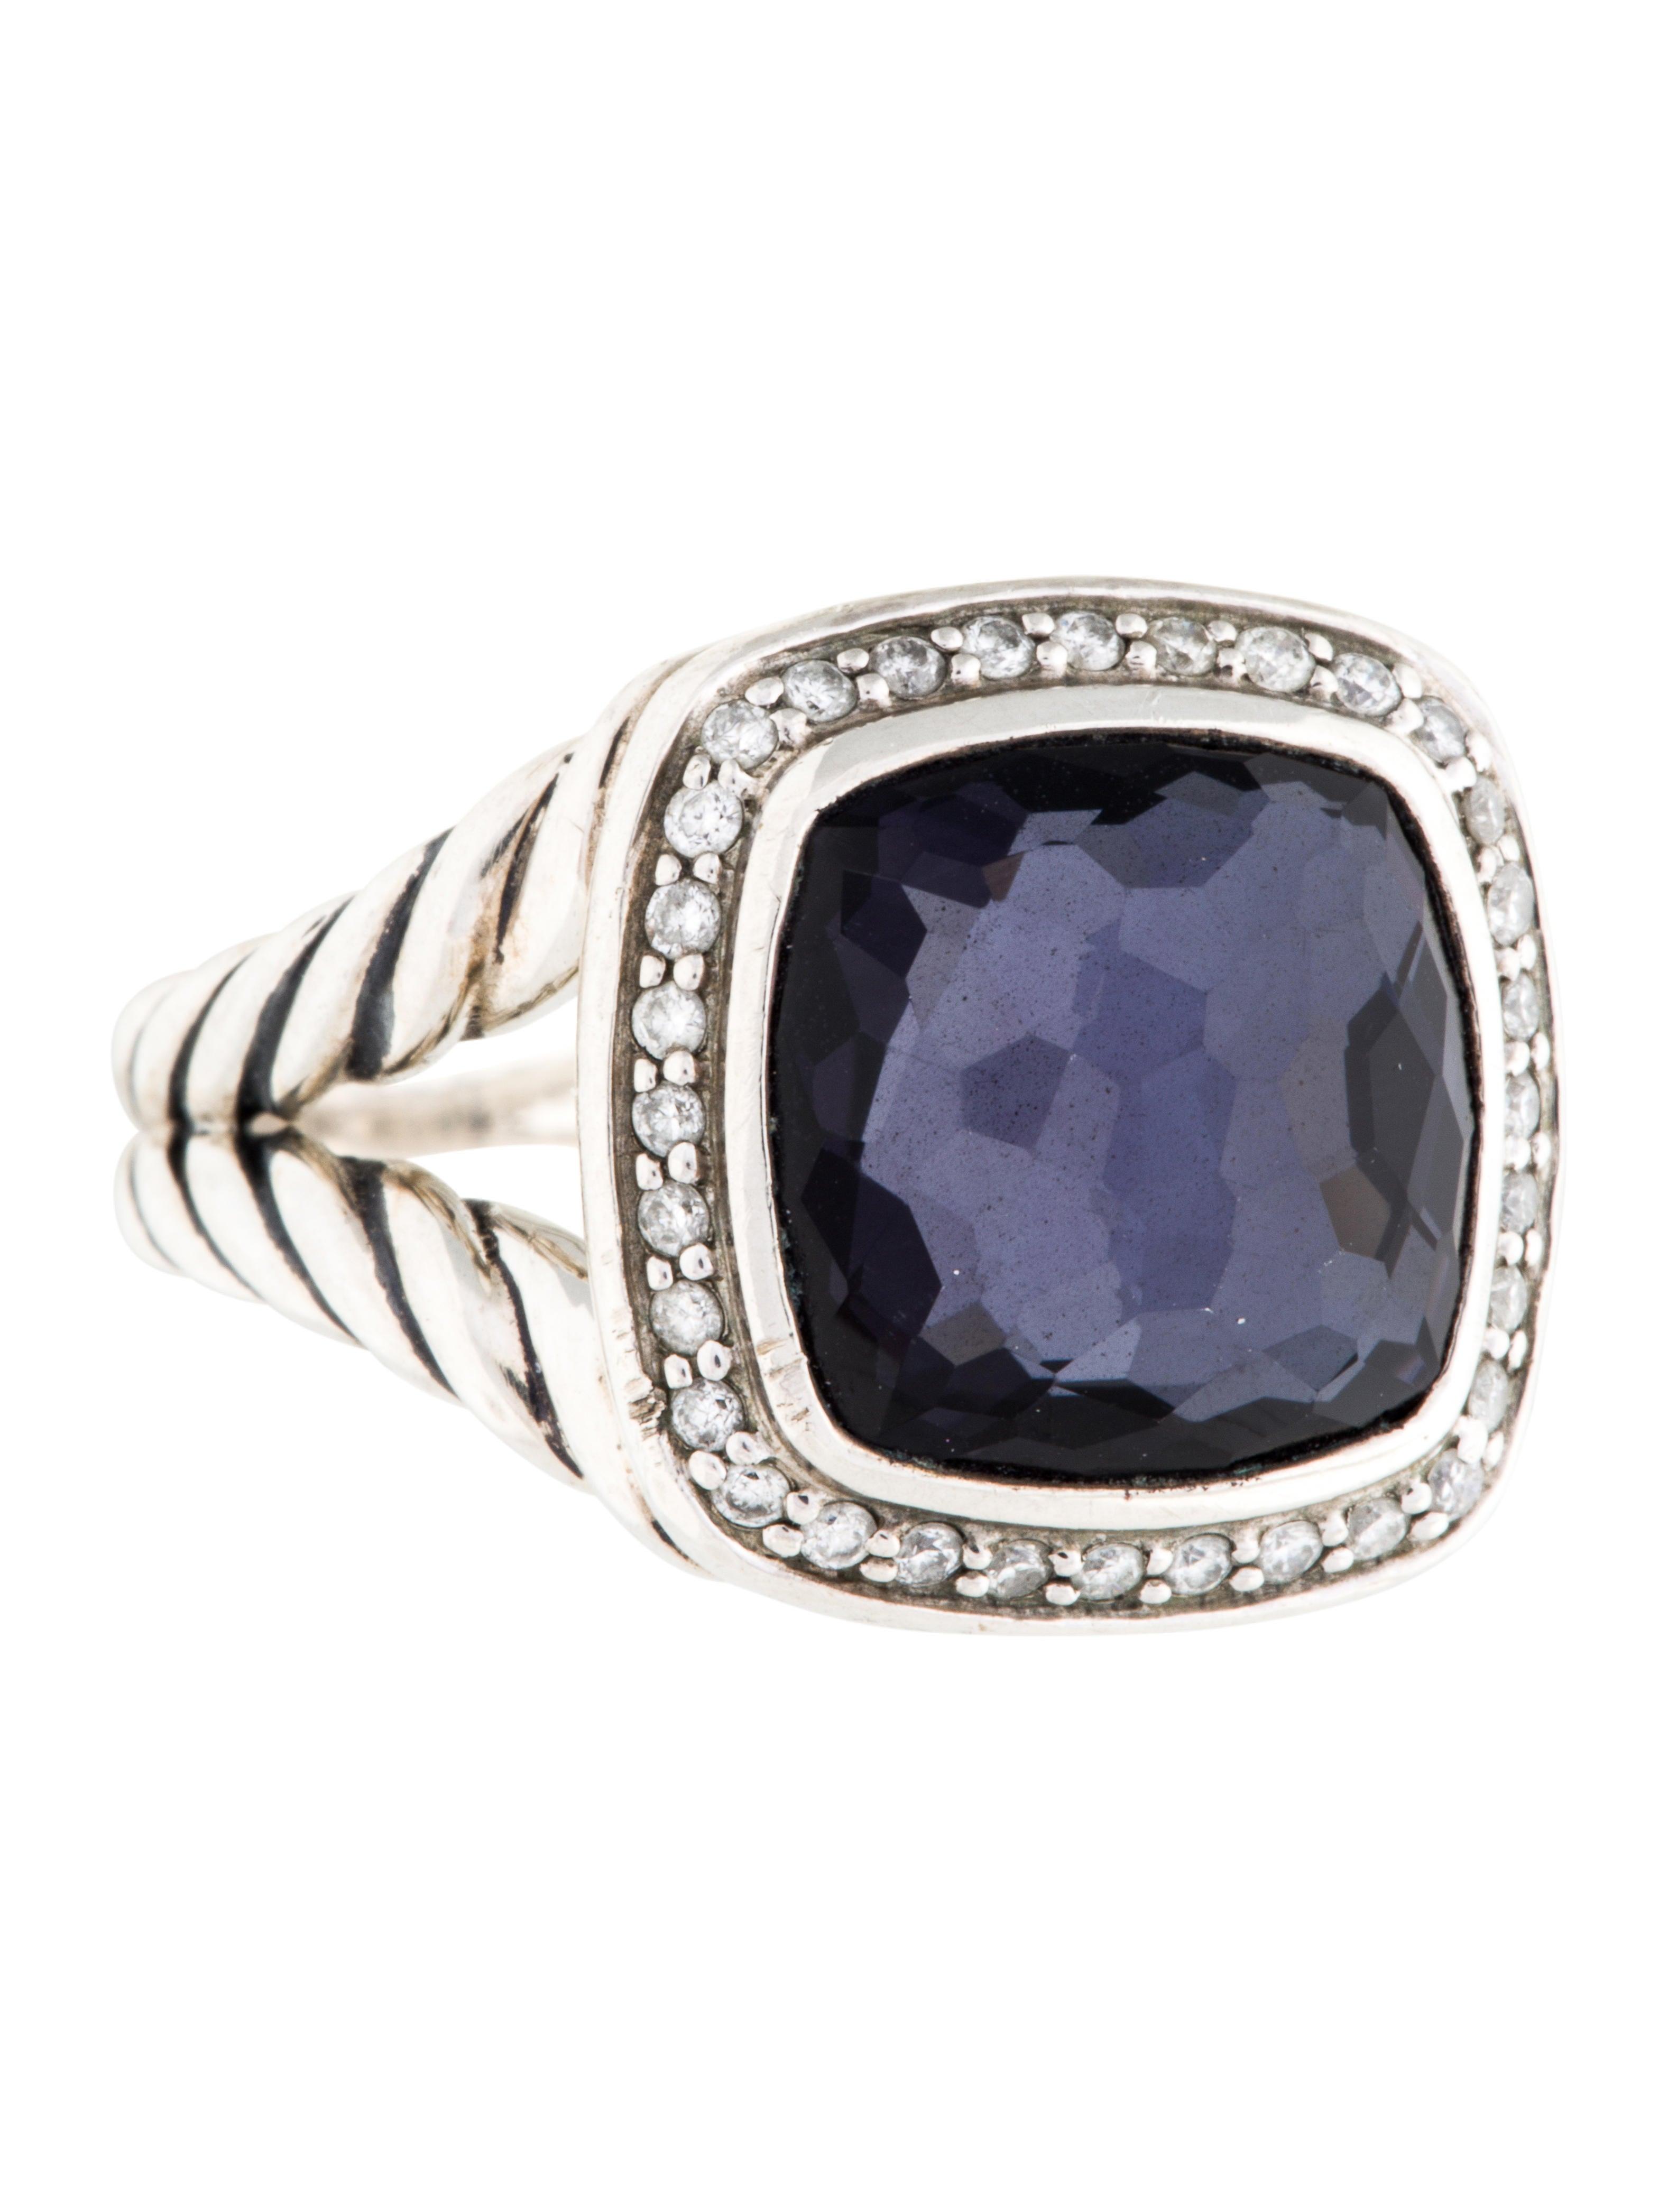 David yurman black orchid diamond albion ring rings for David yurman inspired jewelry rings